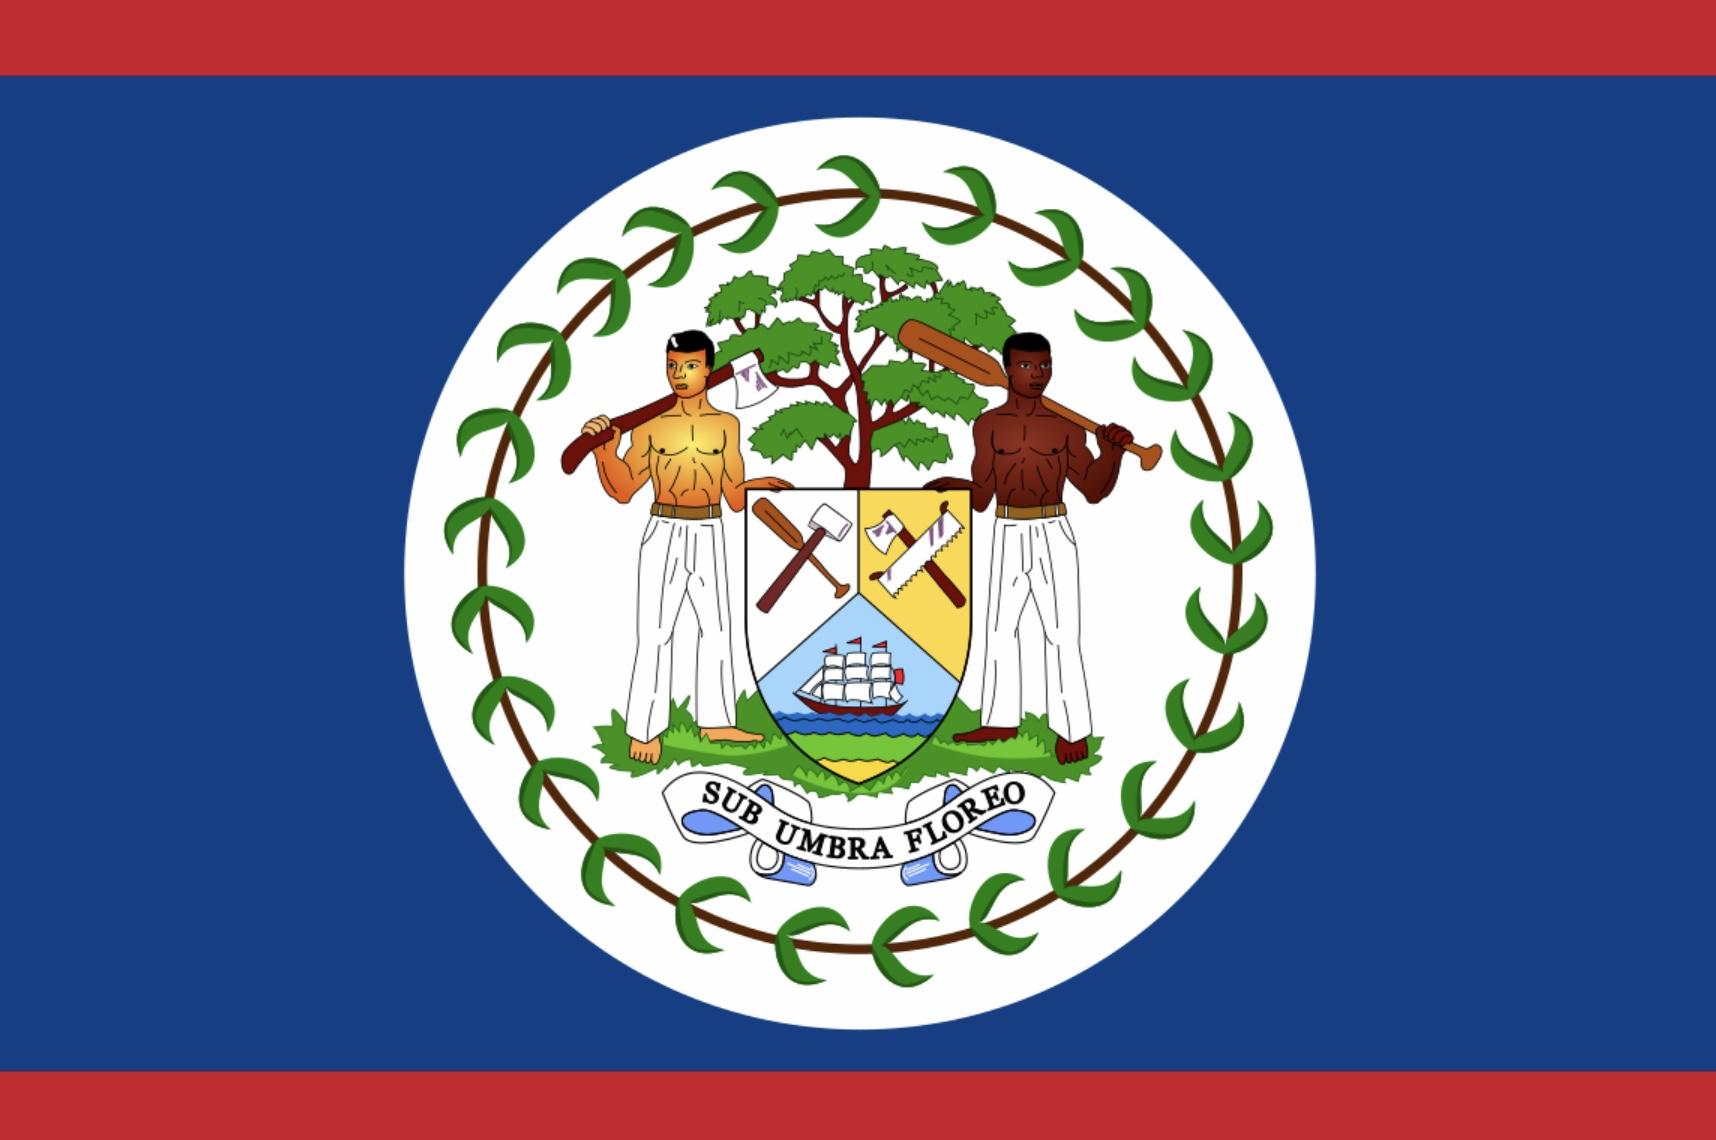 Belize sitt flagg jeg trives i skyggen